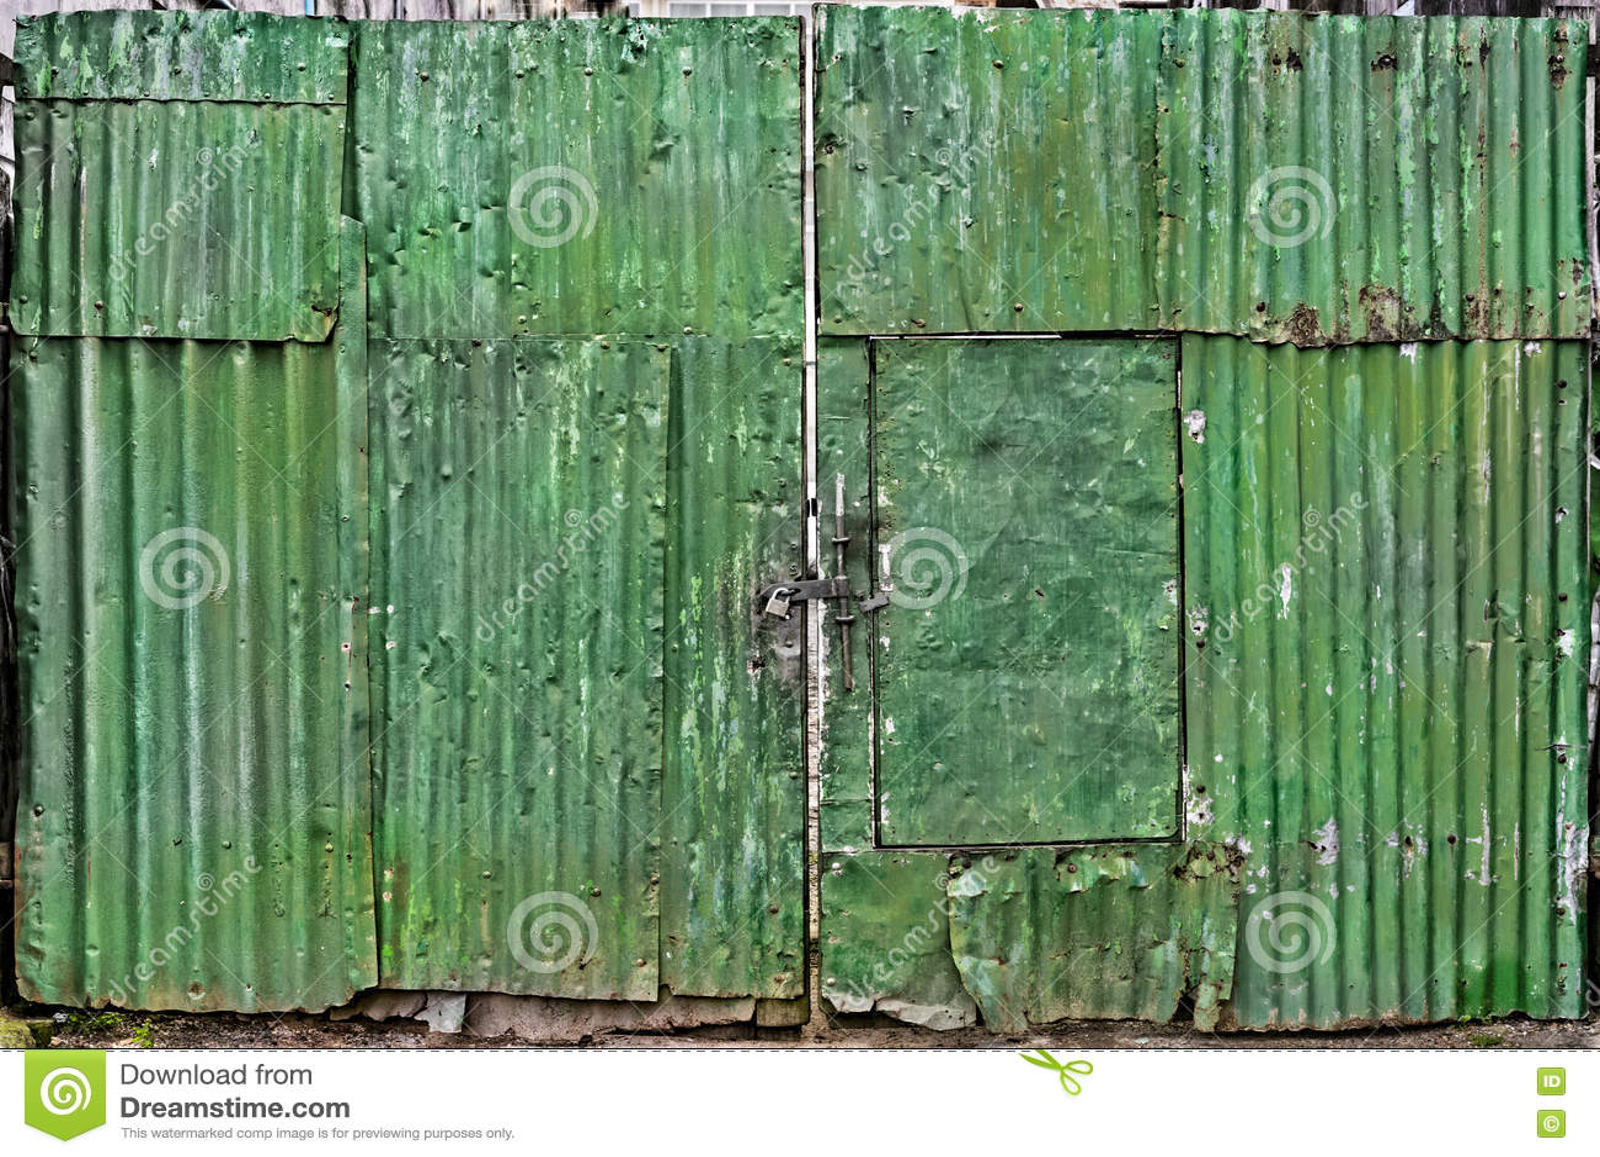 Resultado de imagen para  pared de chapas acanaladas oxidadas